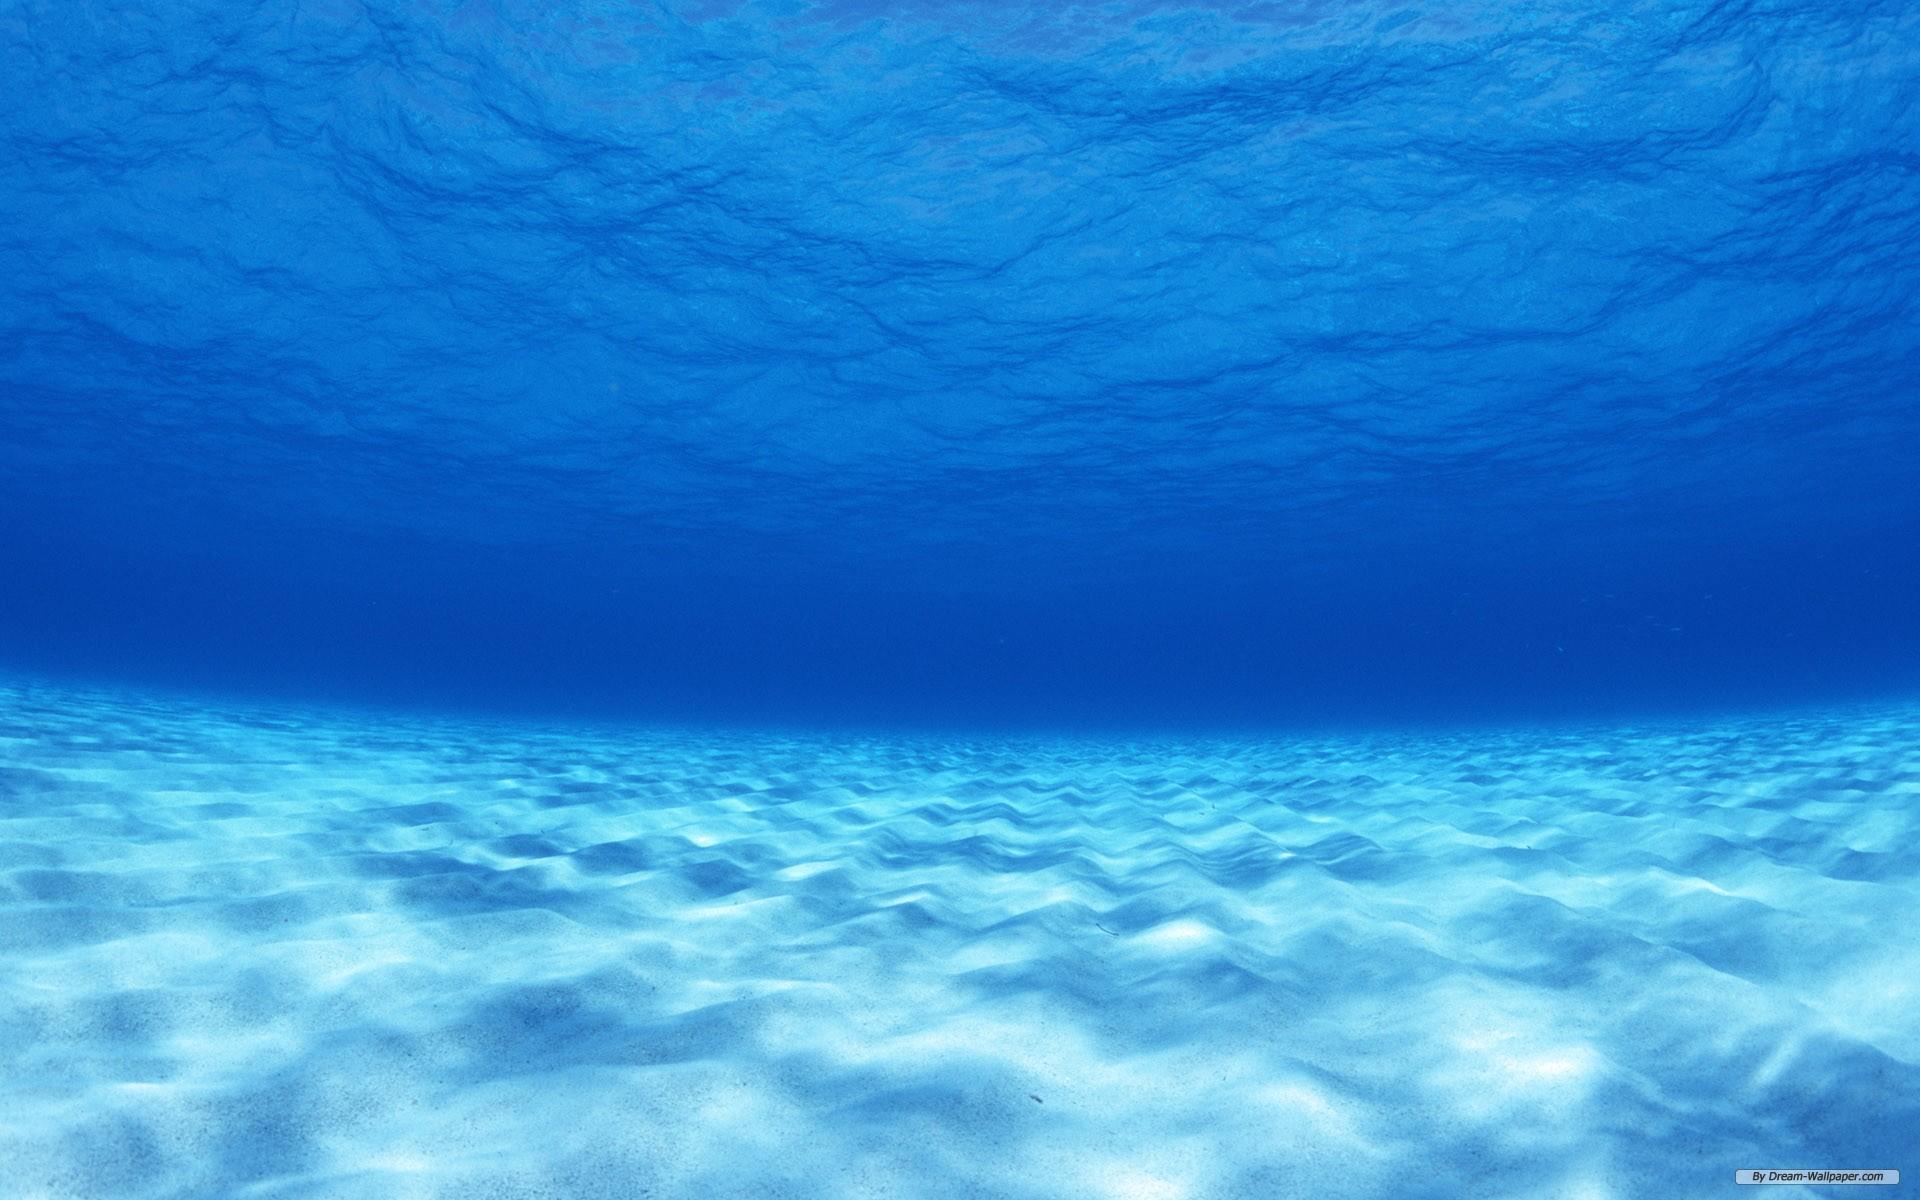 Beach Blue Sky Blue Water wallpapers (Desktop, Phone, Tablet ...